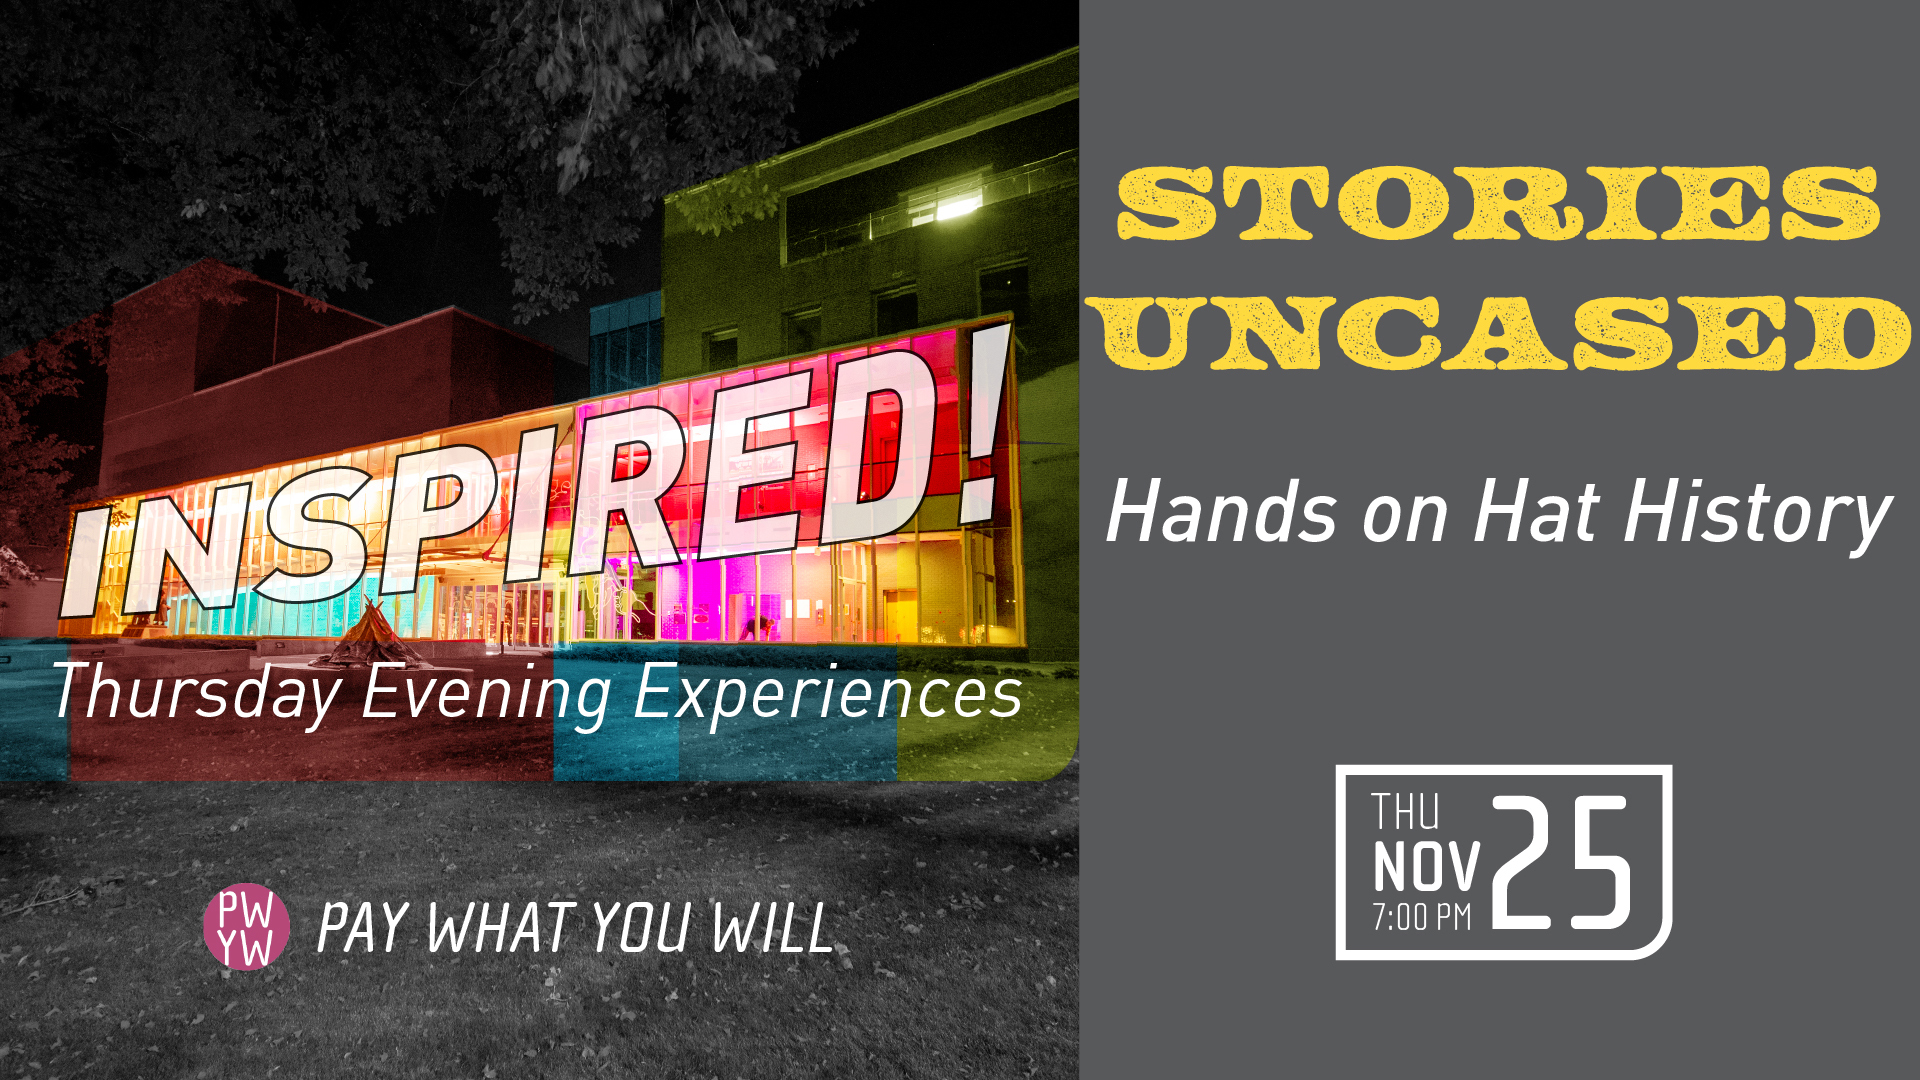 Inspired! Stories Uncased